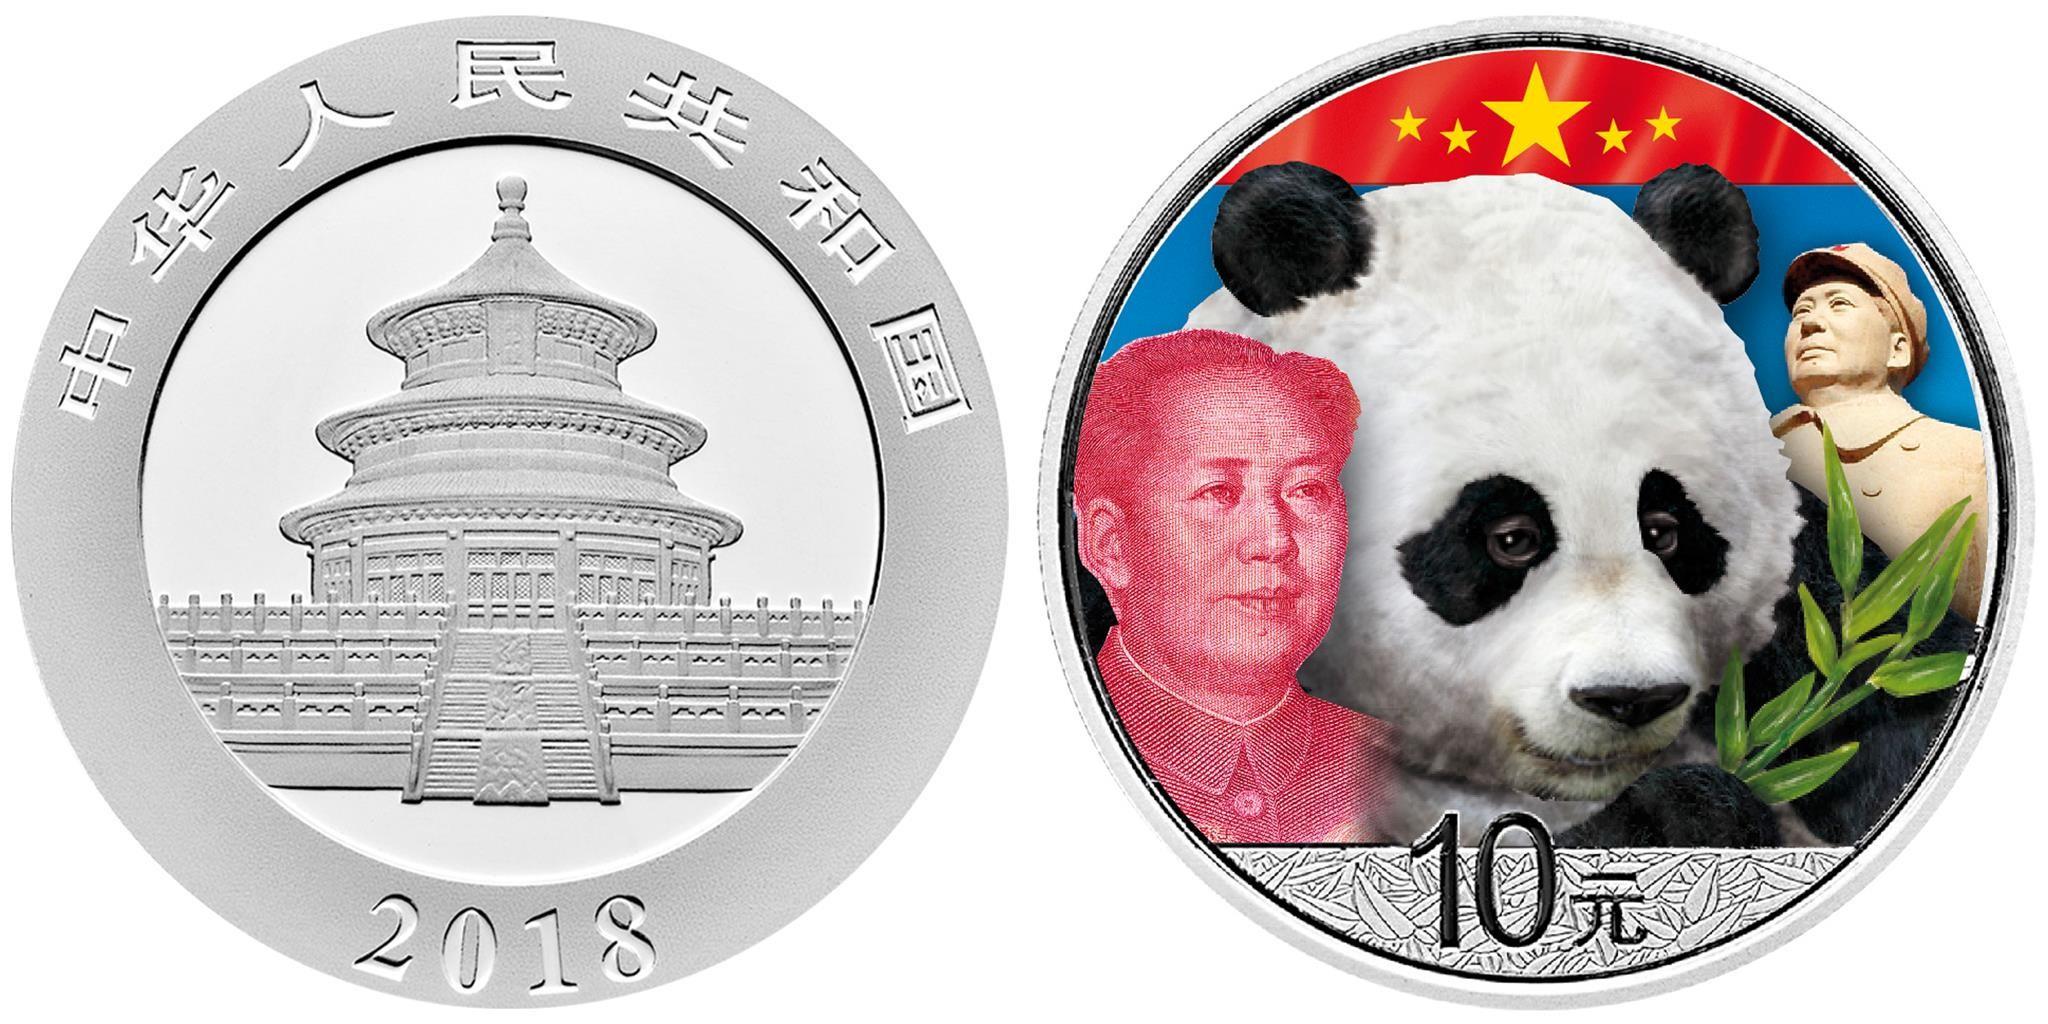 chine 2018 panda mao zedong